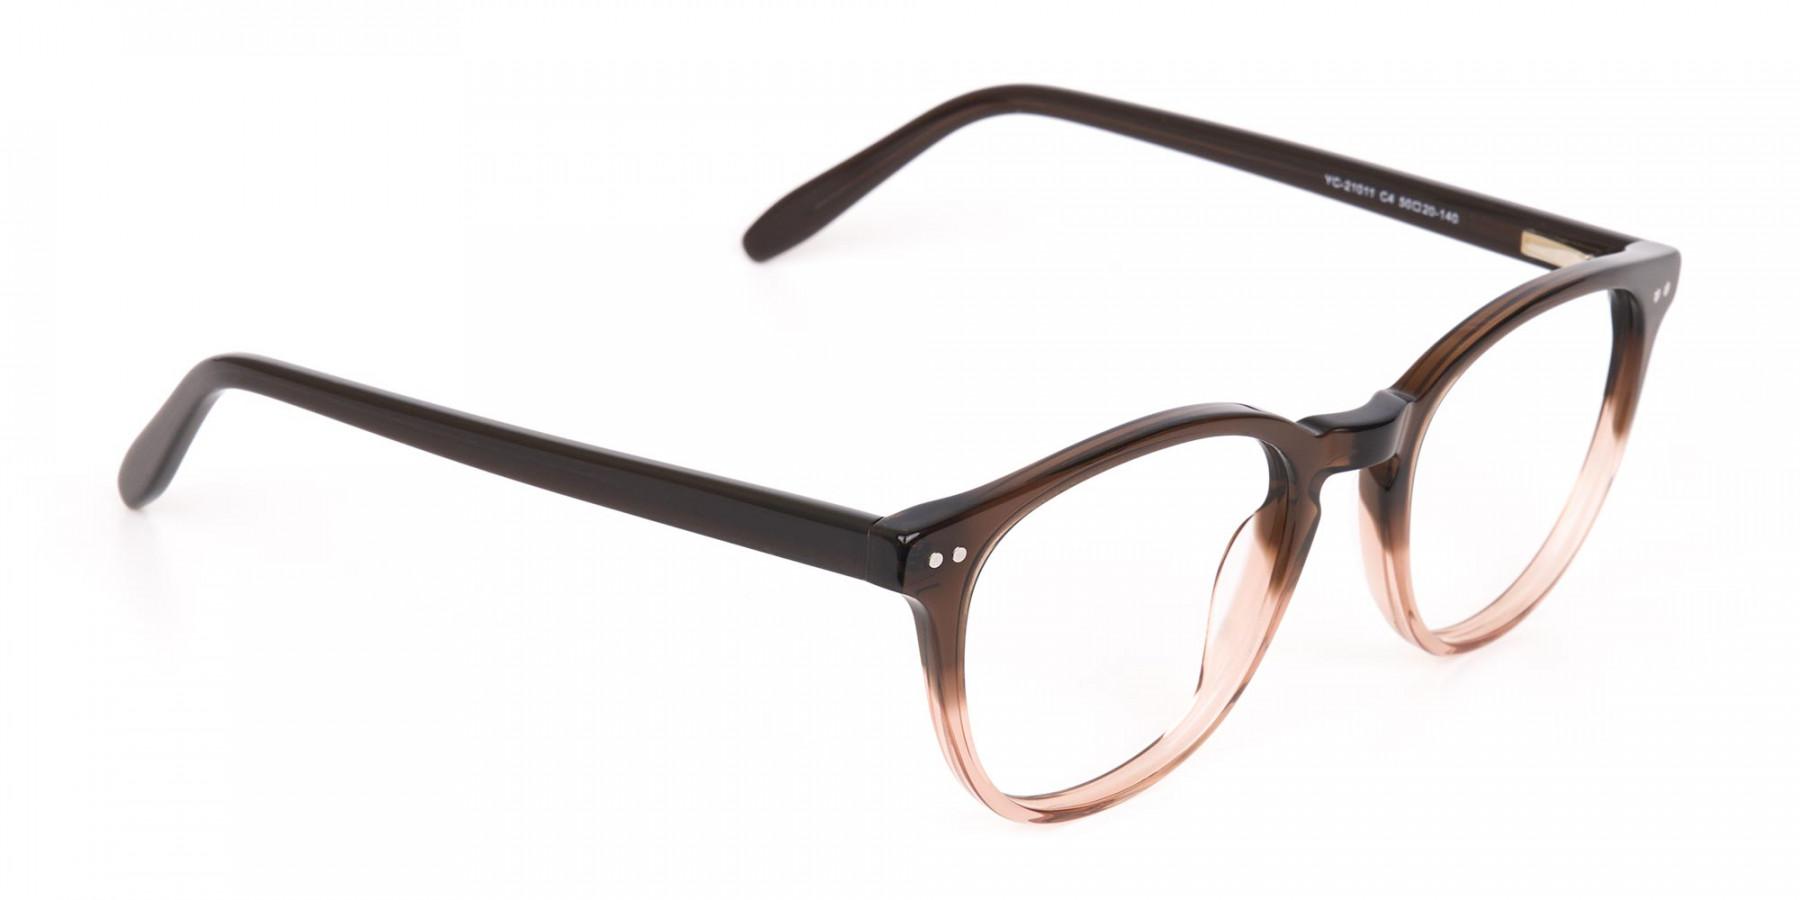 Mocha Brown & Crystal Beige Two-Tone Glasses-1